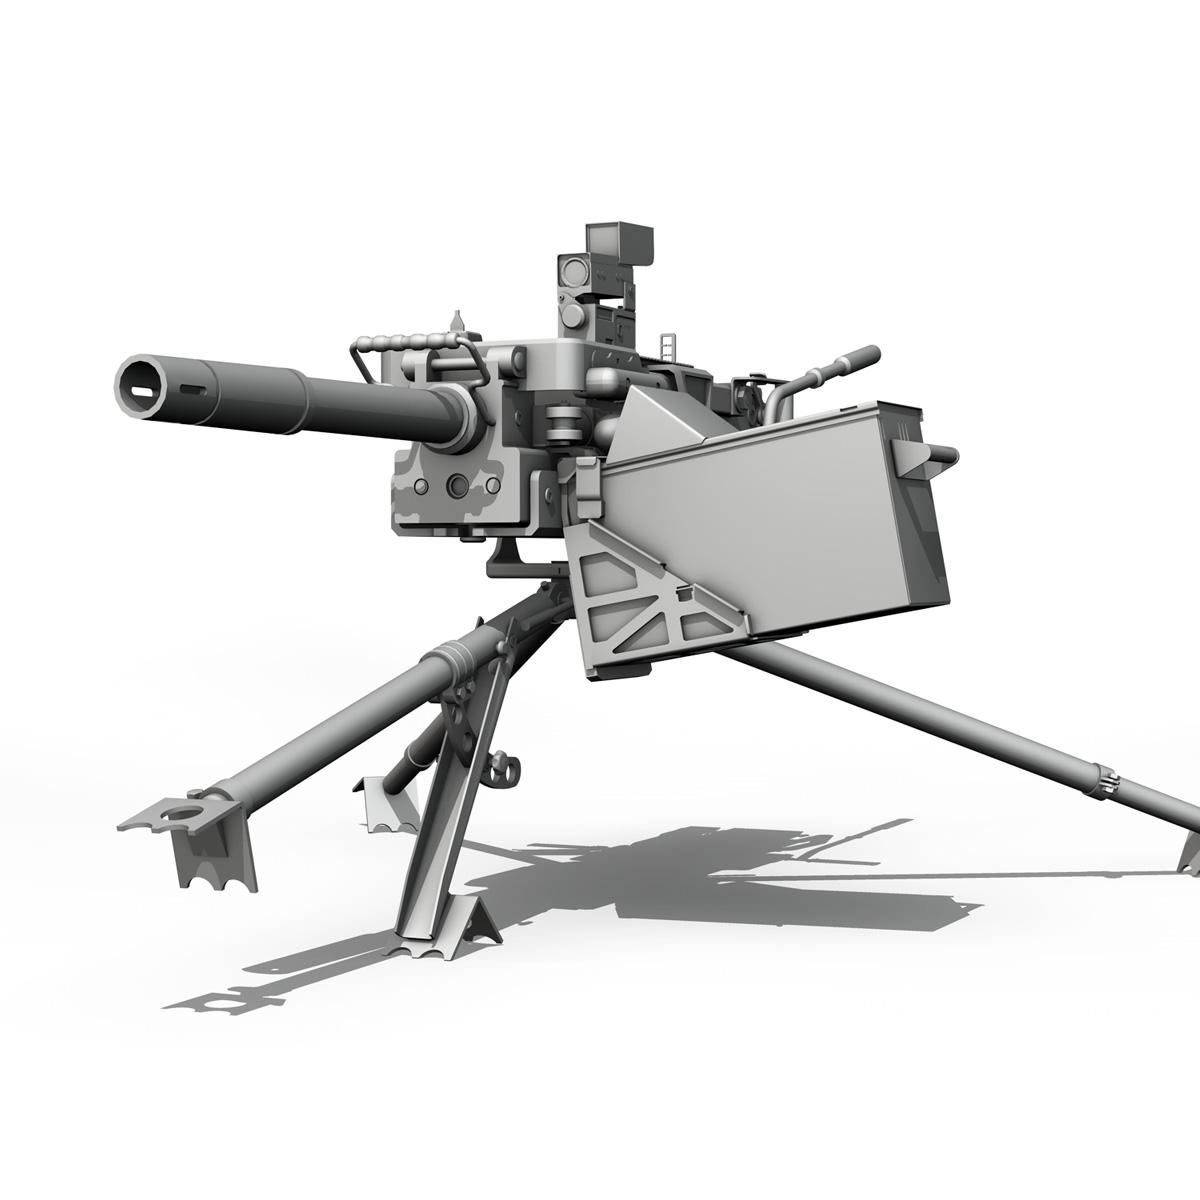 40mm qumbara pulemyotu gmg 3d model c4d lwo 3dm obj 264296